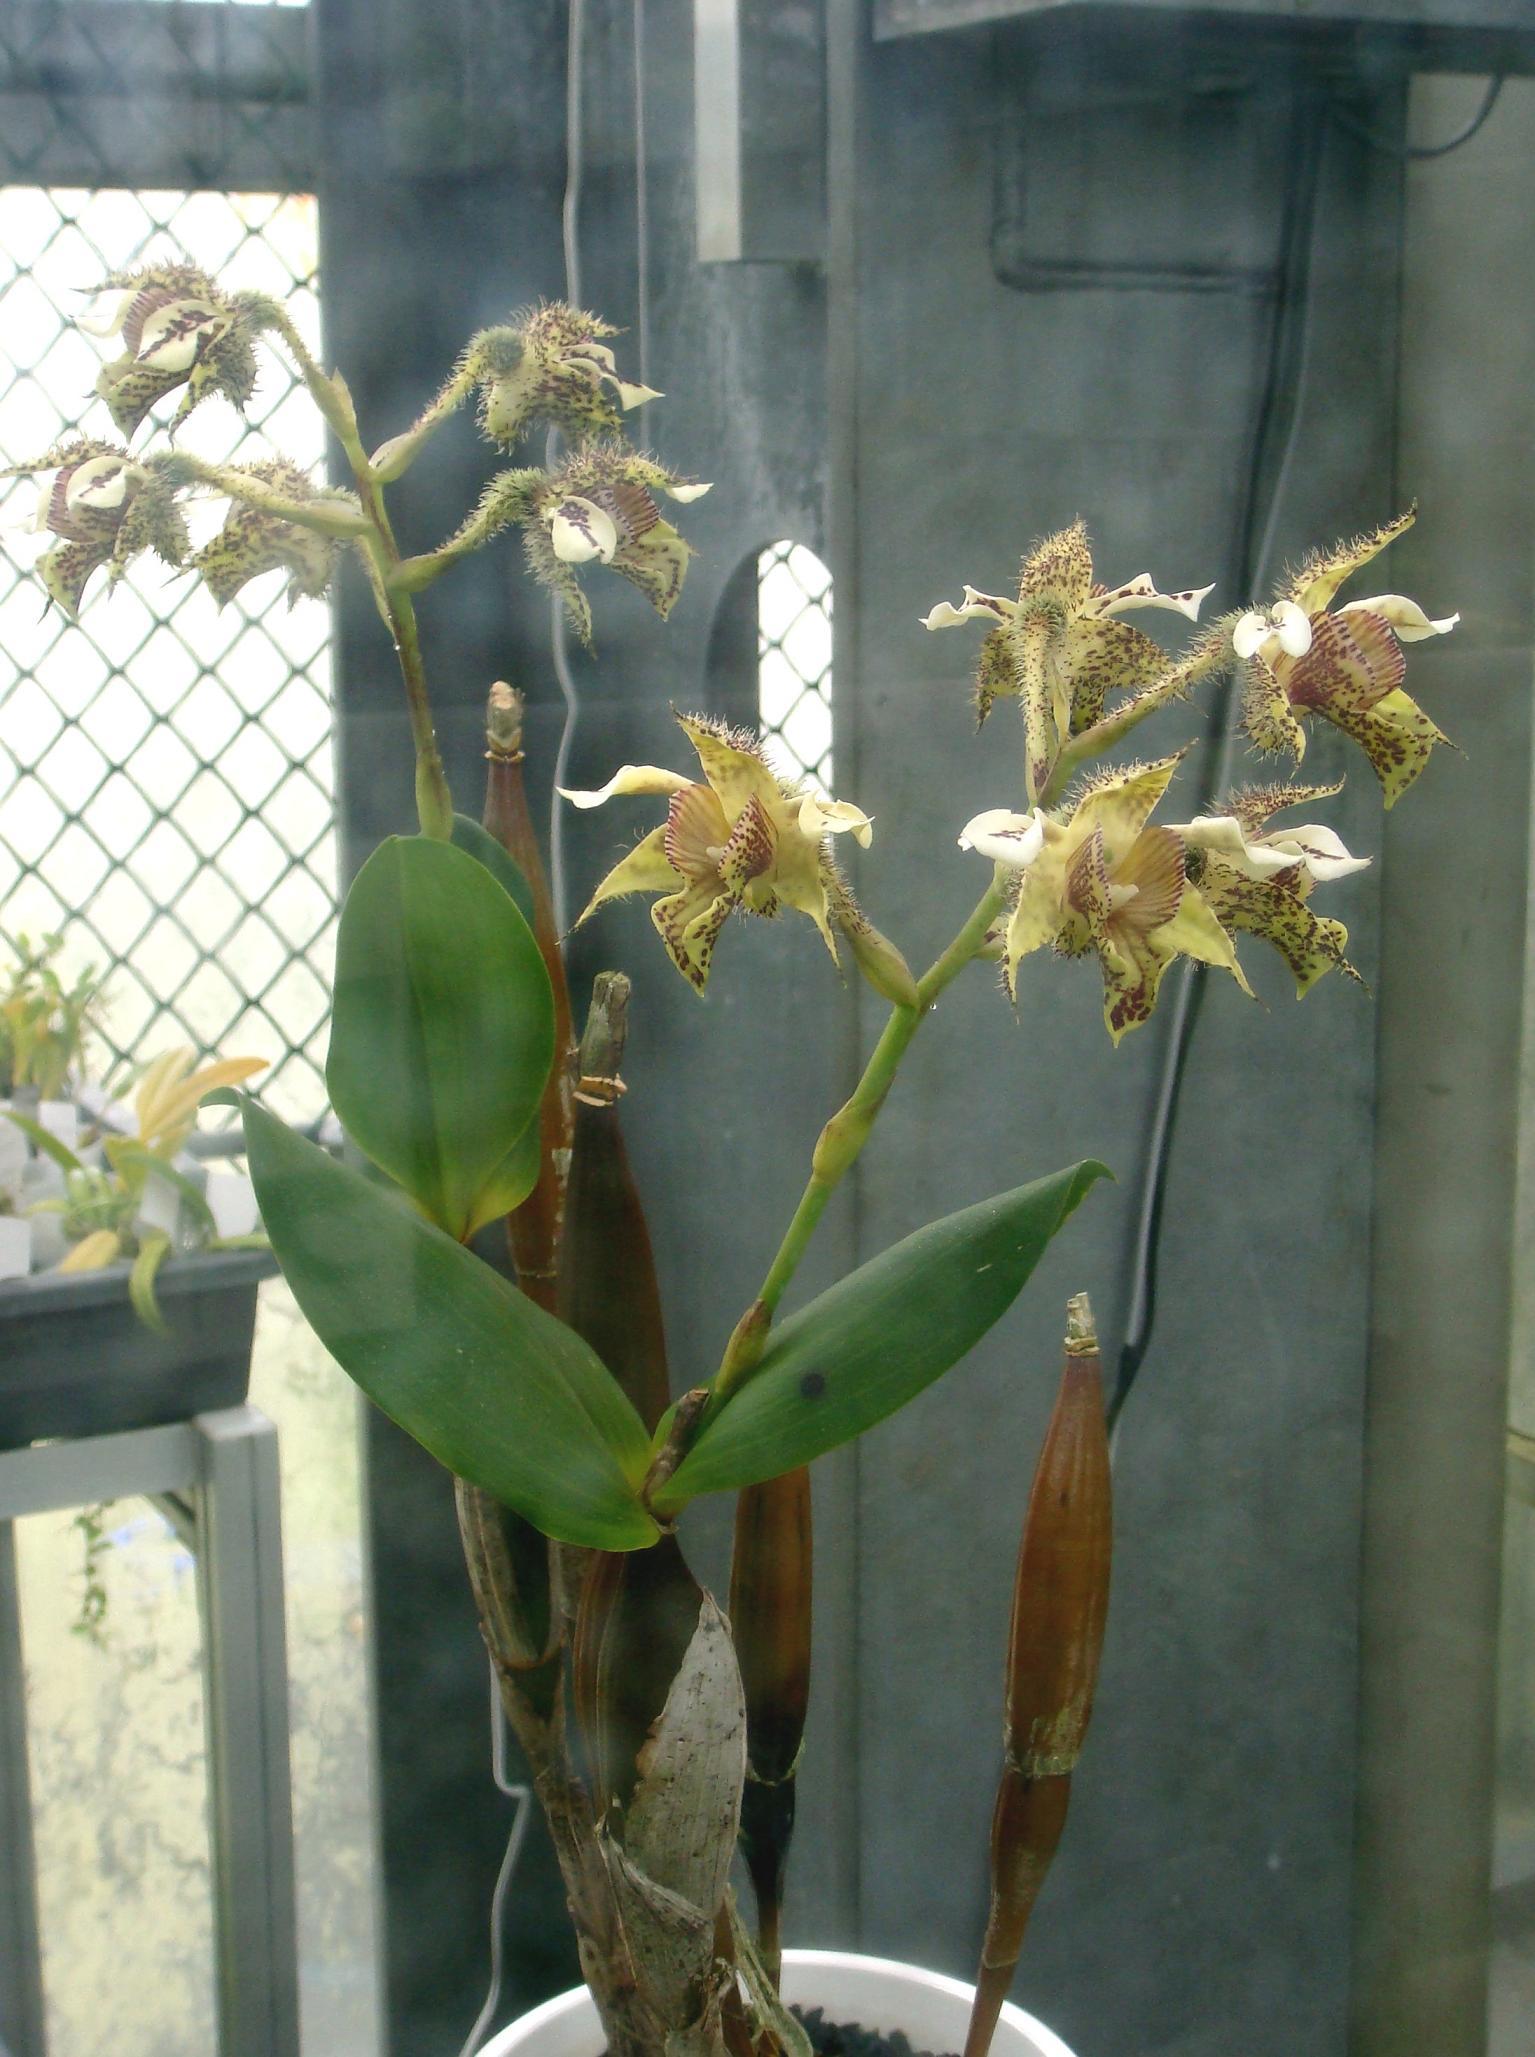 http://orchids.la.coocan.jp/Dendrobium/Dendrobium%20finisterrae/DSC00720.JPG